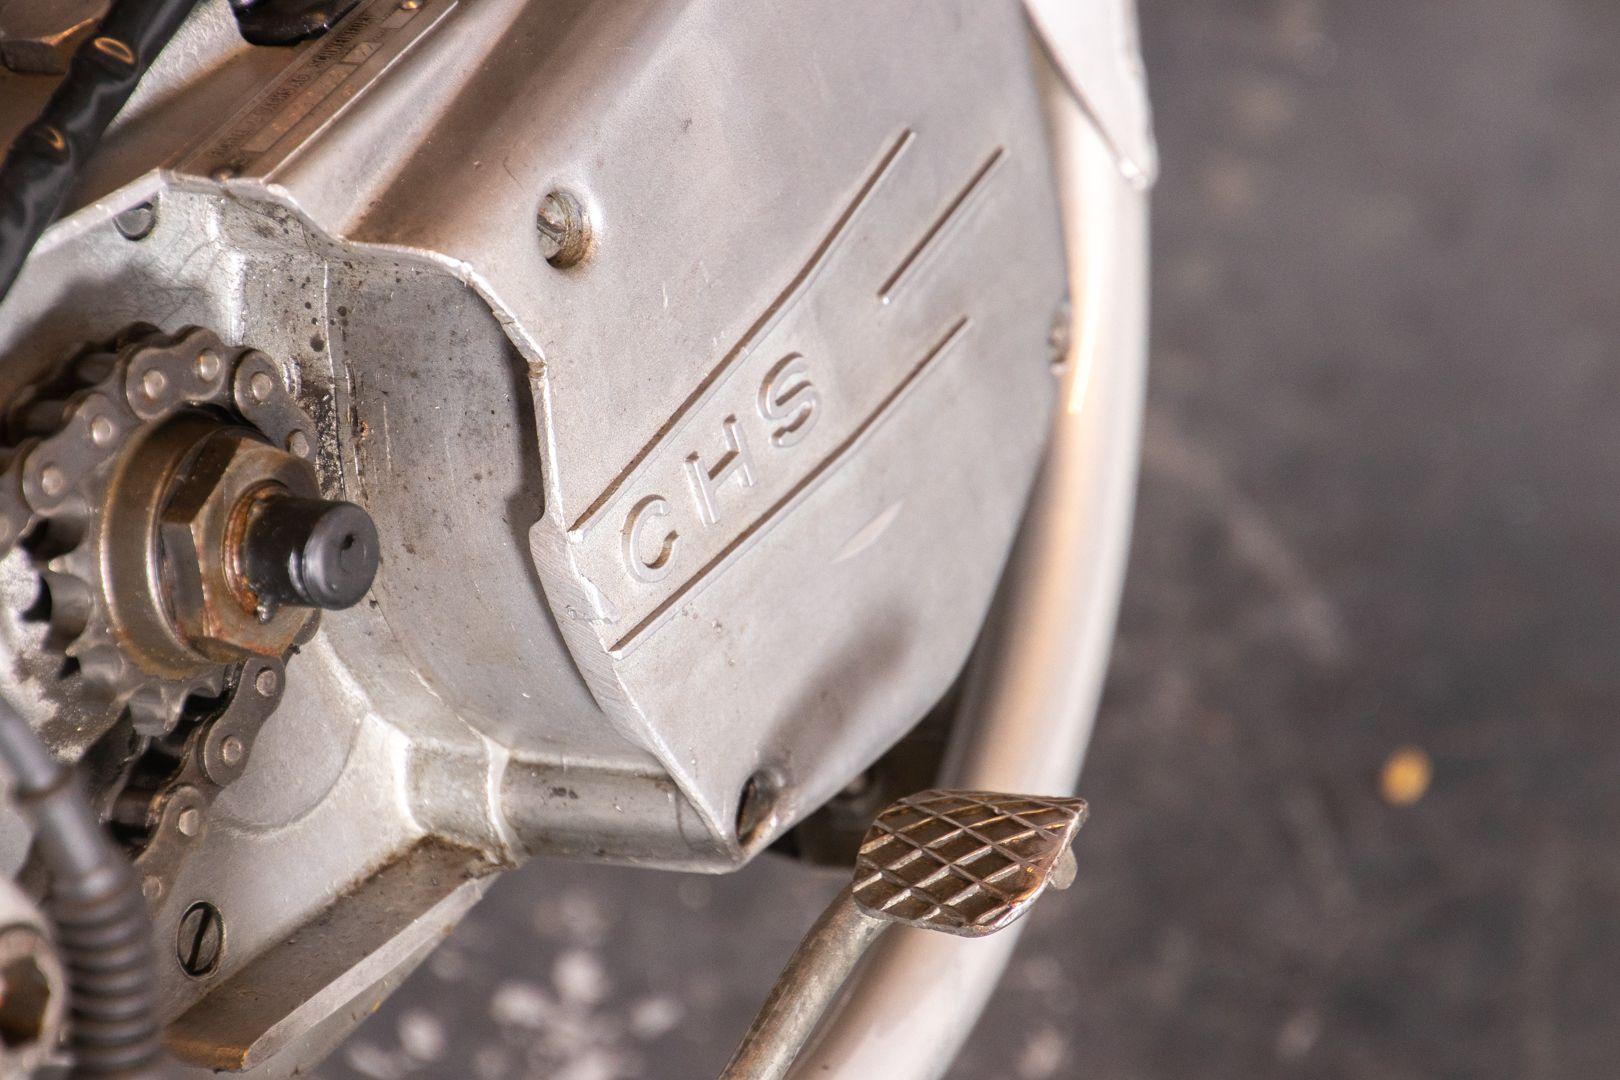 1974 KTM 125 GS 48758